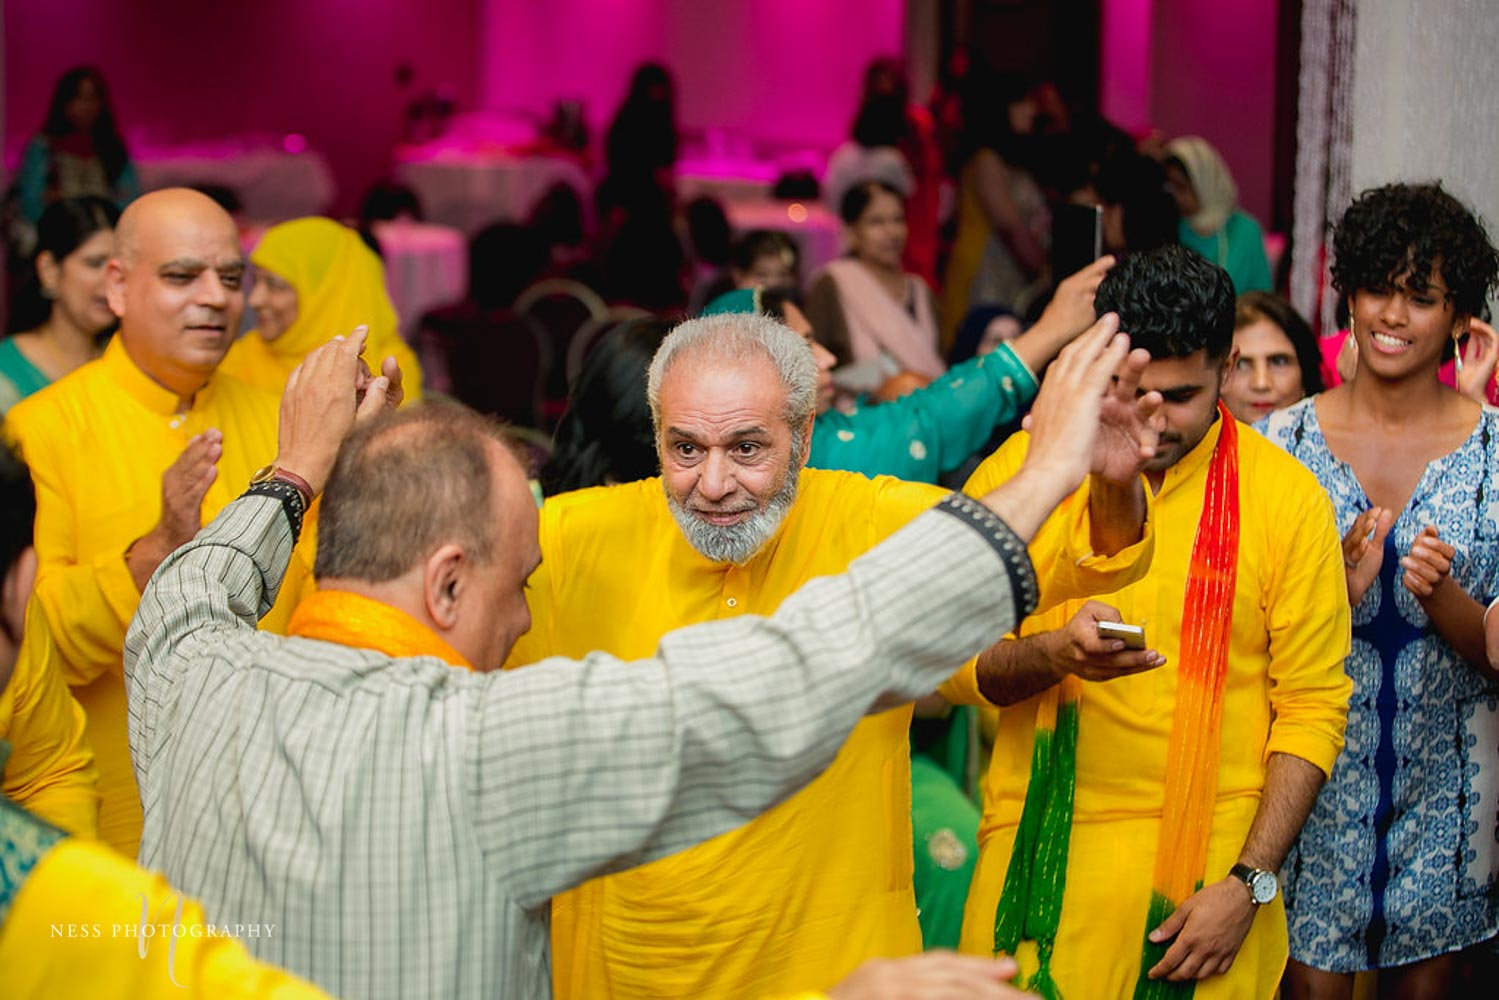 grandpa in yellow sherwani dancing at the pakistani mehendi in ottawa